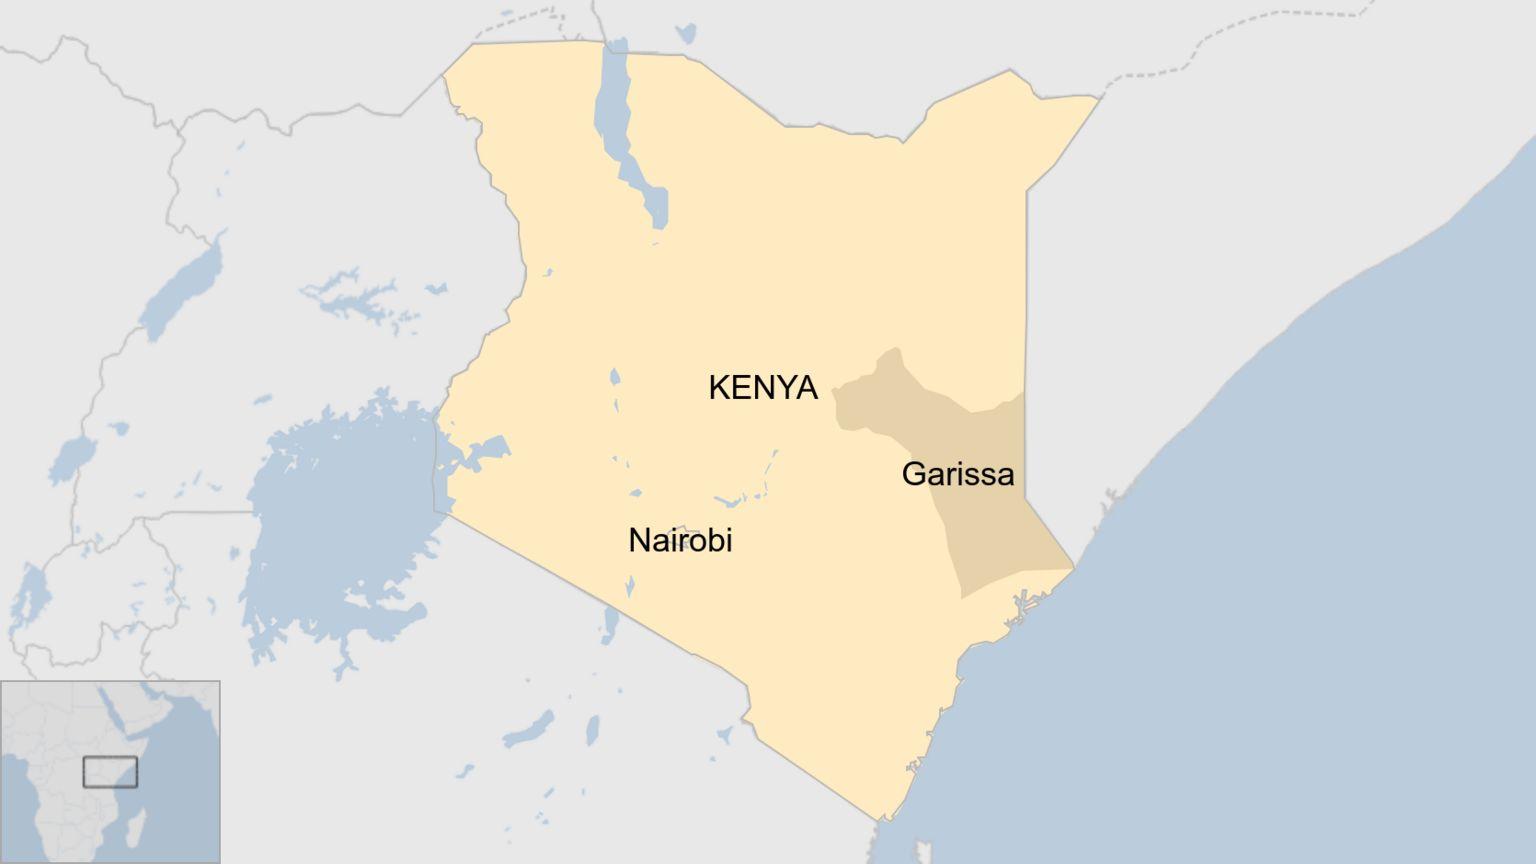 Map showing Garissa County in Kenya